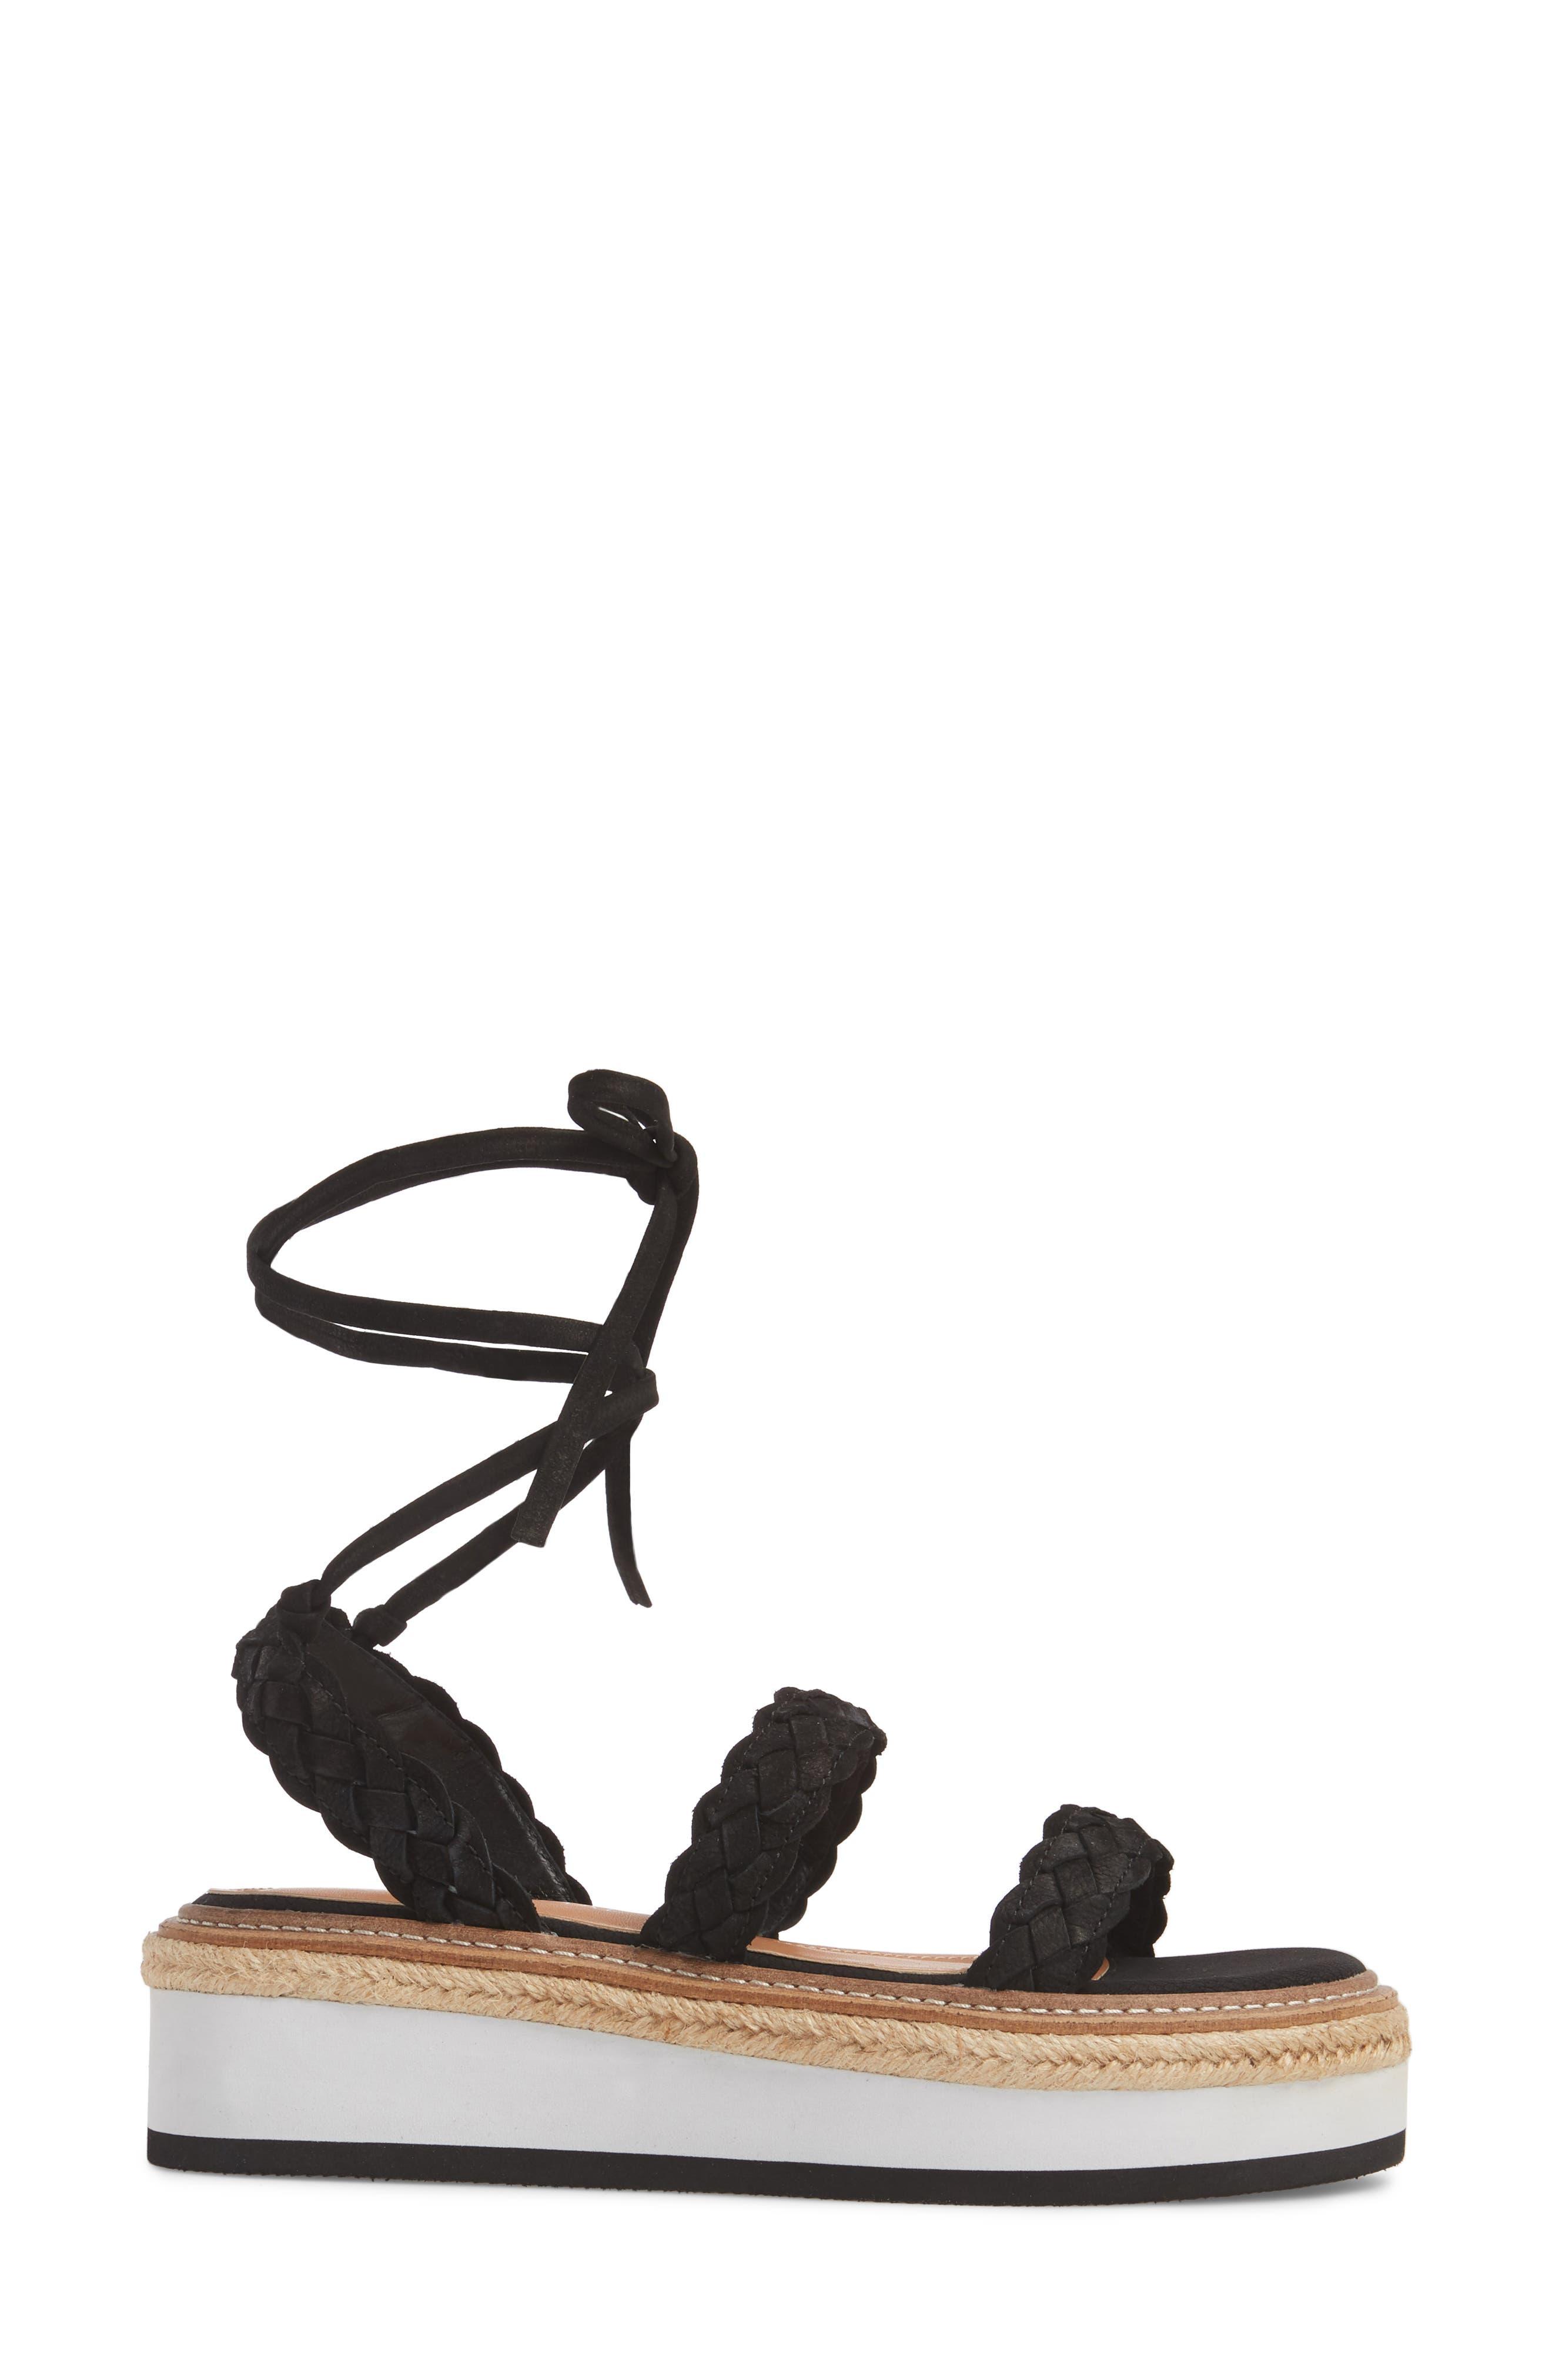 Nieve Braided Platform Sandal,                             Alternate thumbnail 3, color,                             001